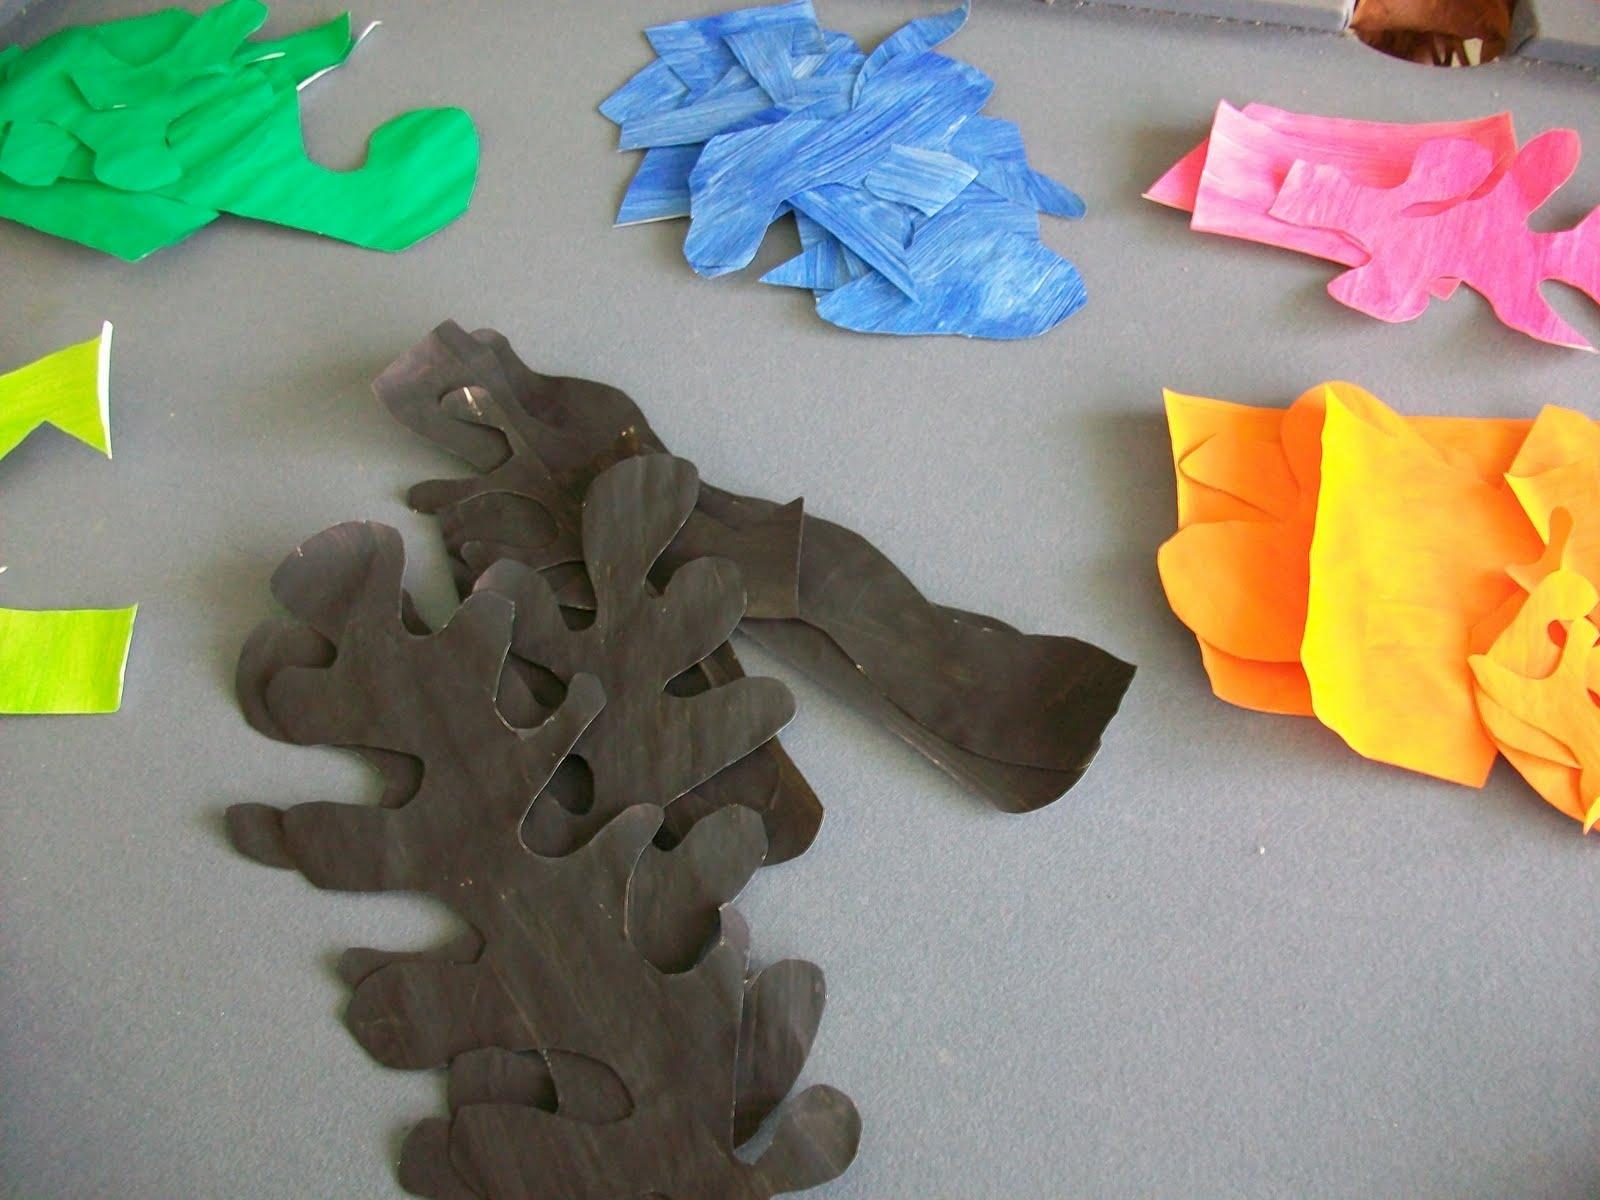 henri matisse painting with scissors modern art 4 kids